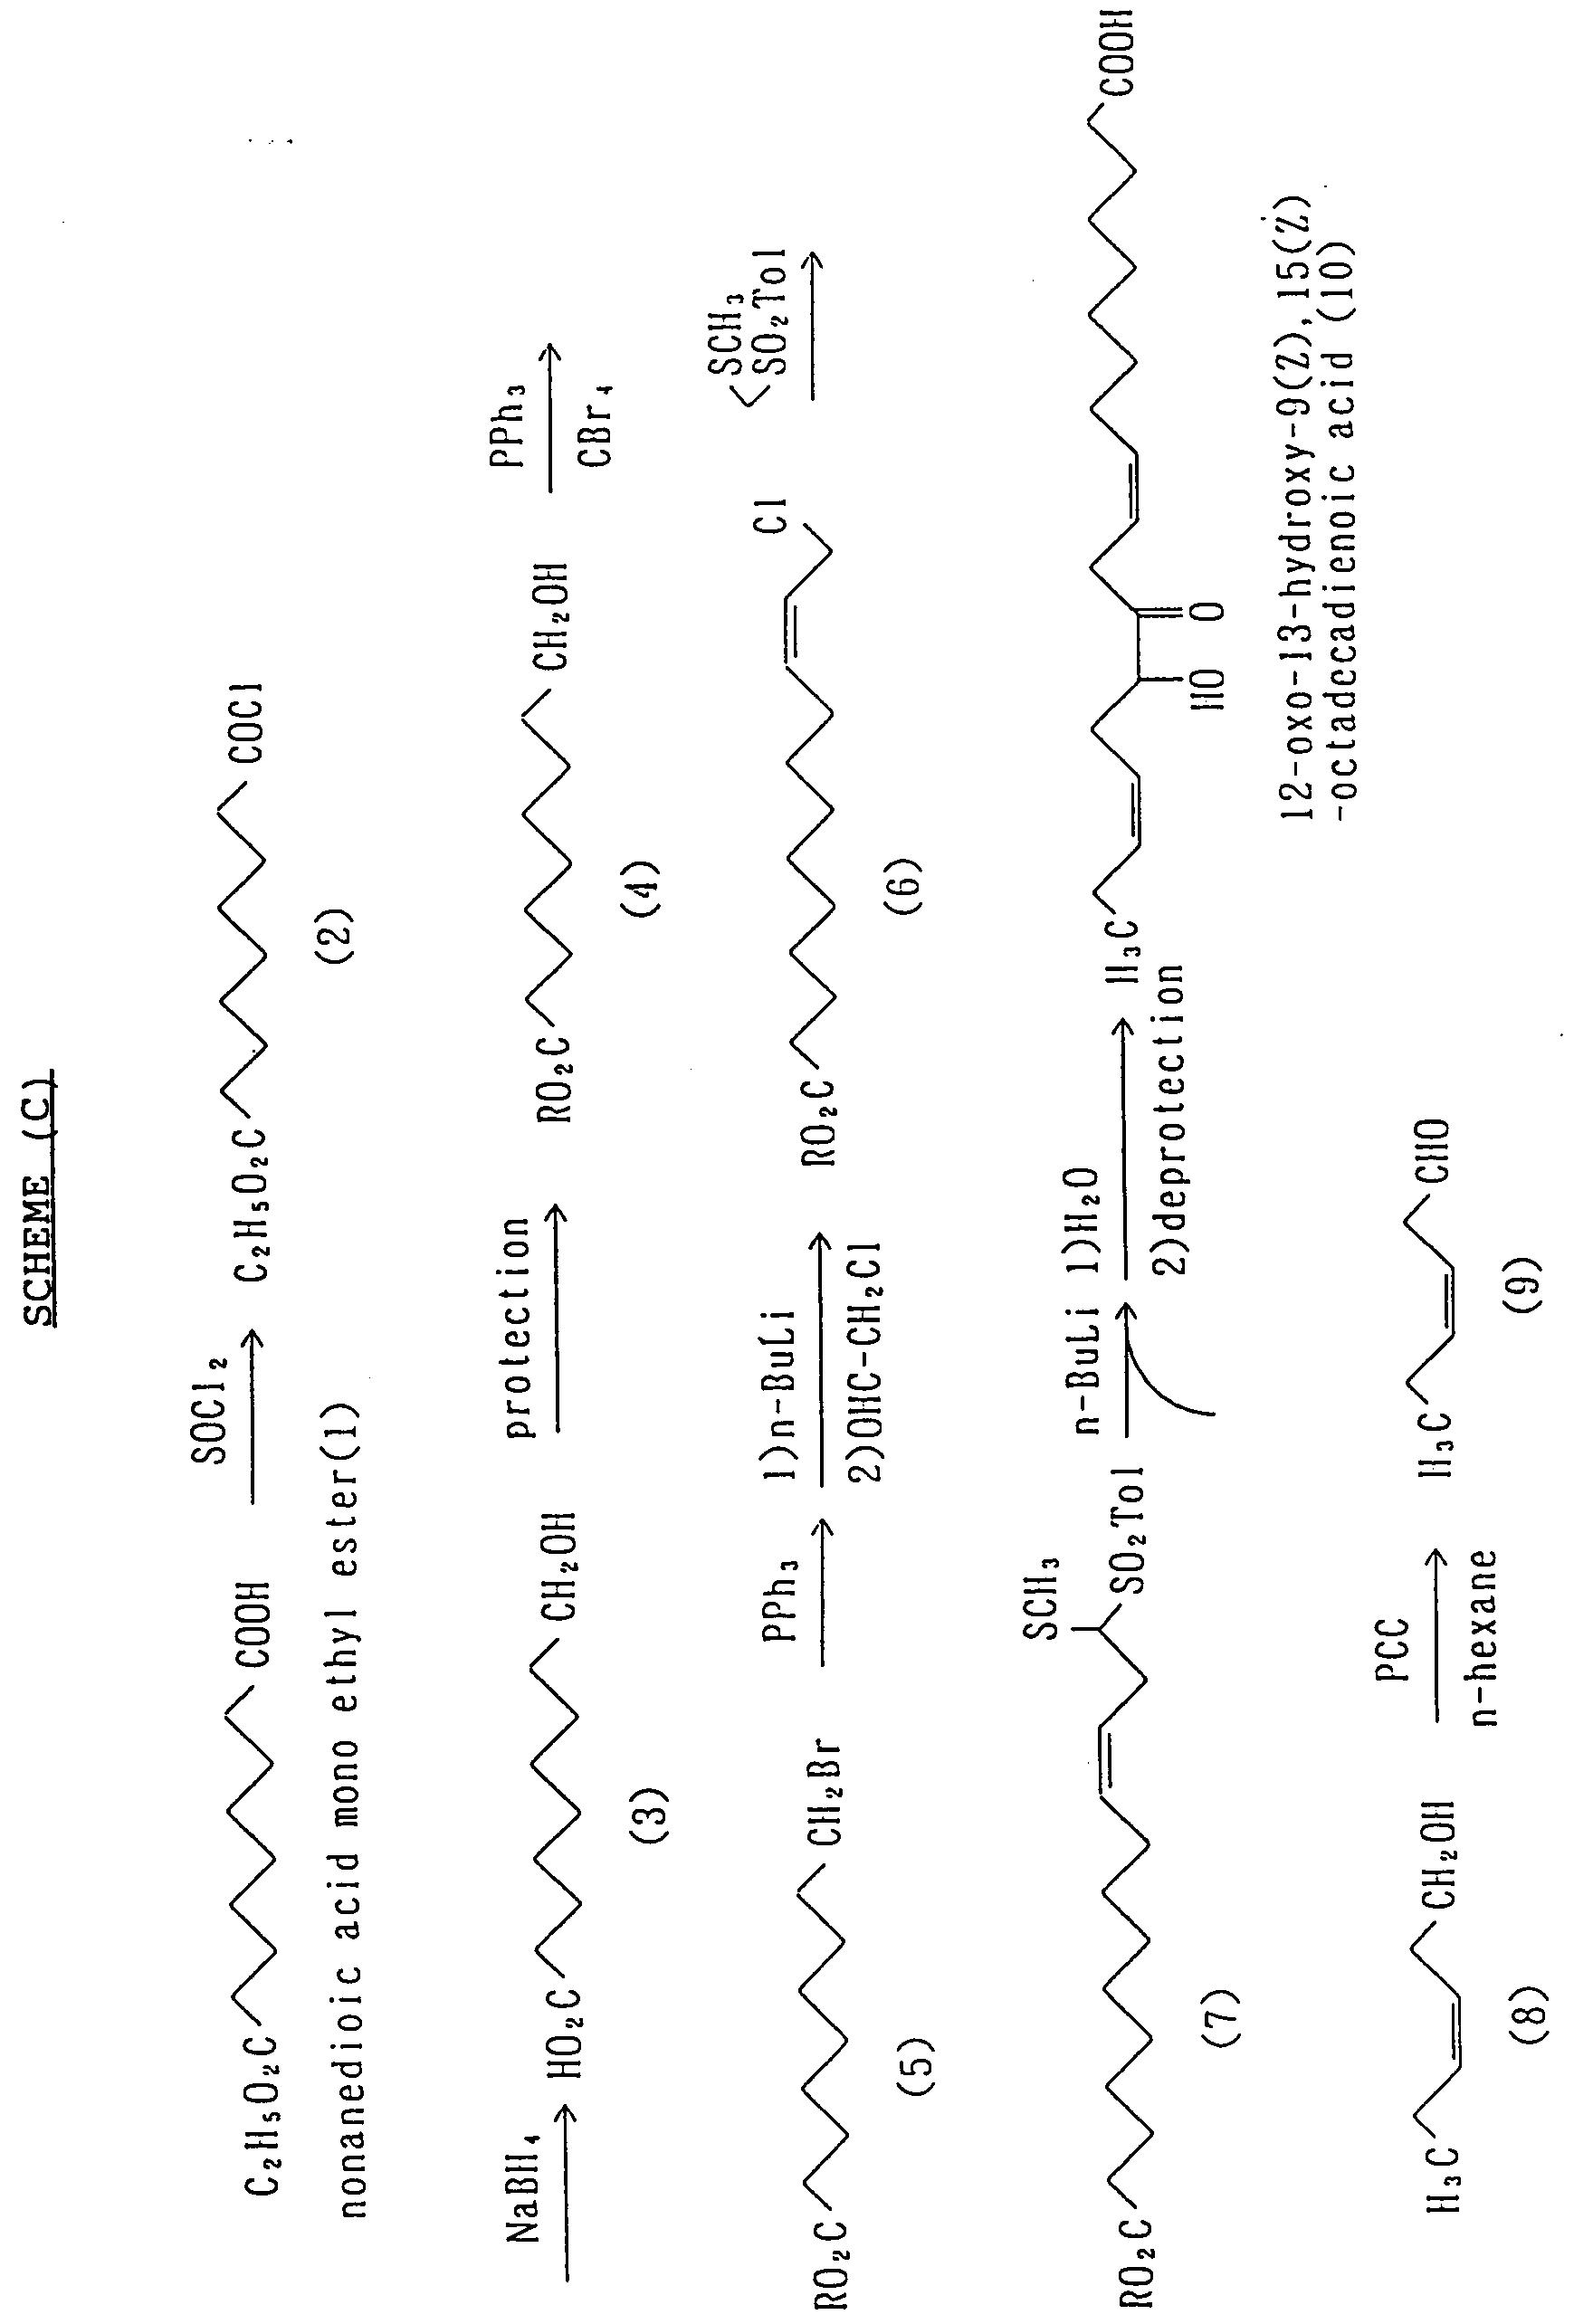 Lfg2000 analytical essay